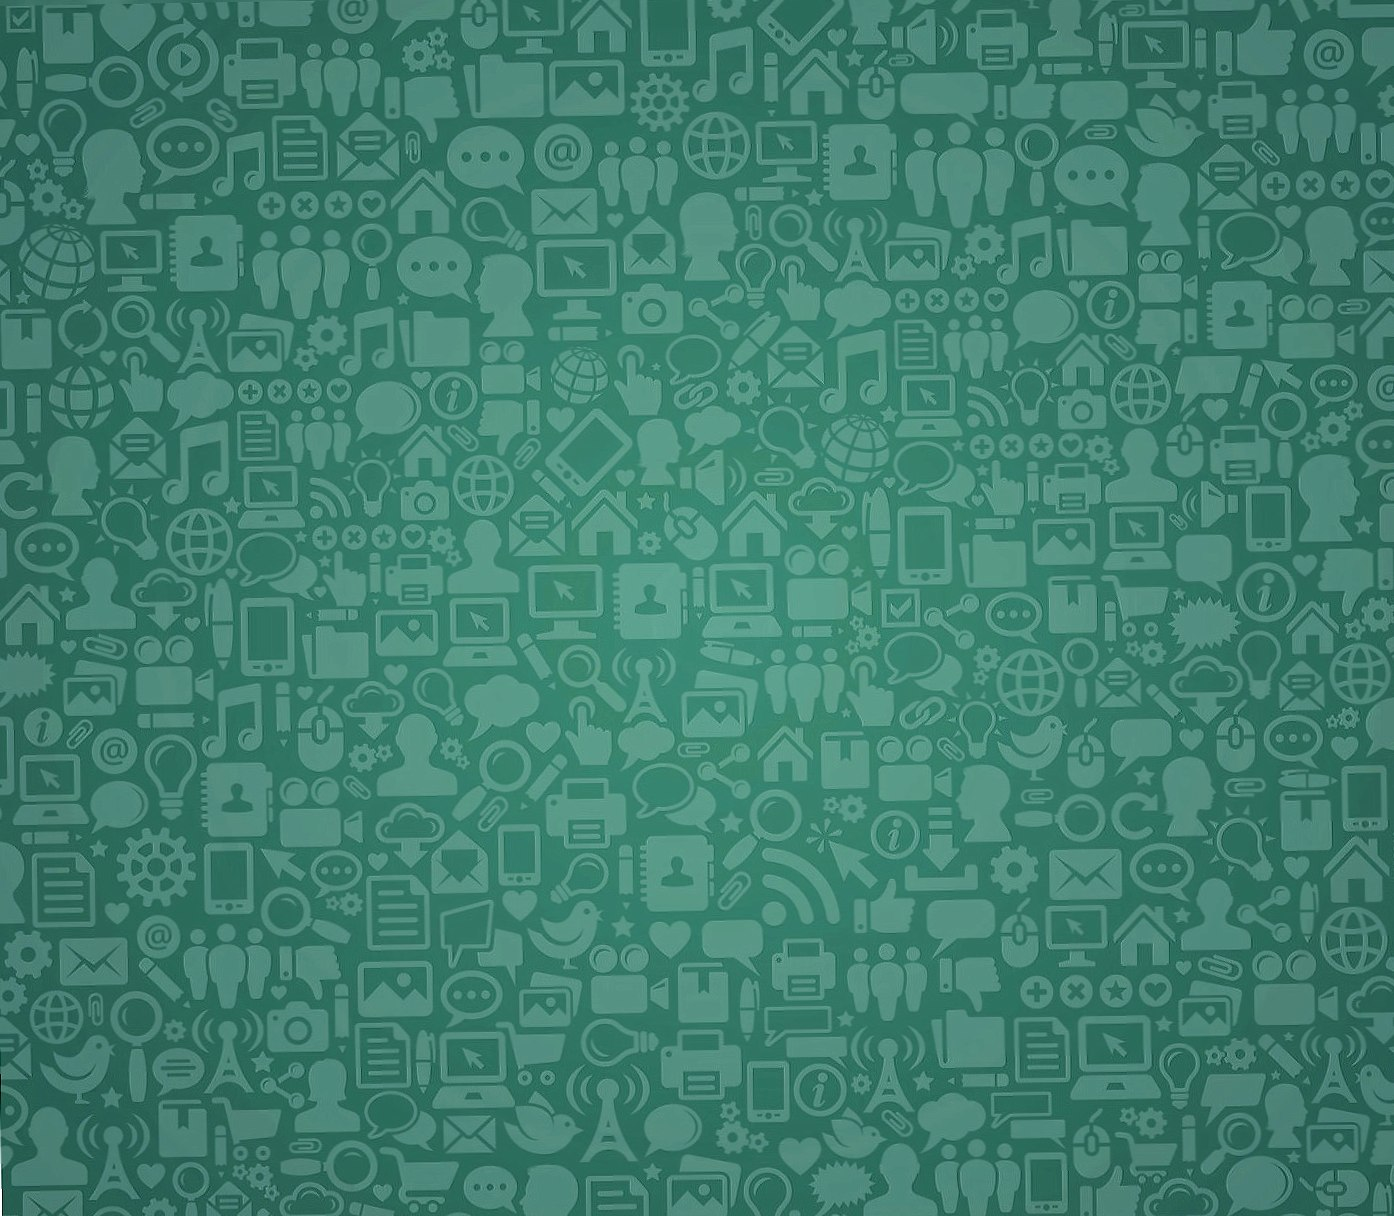 WhatsApp wallpapers HD quality